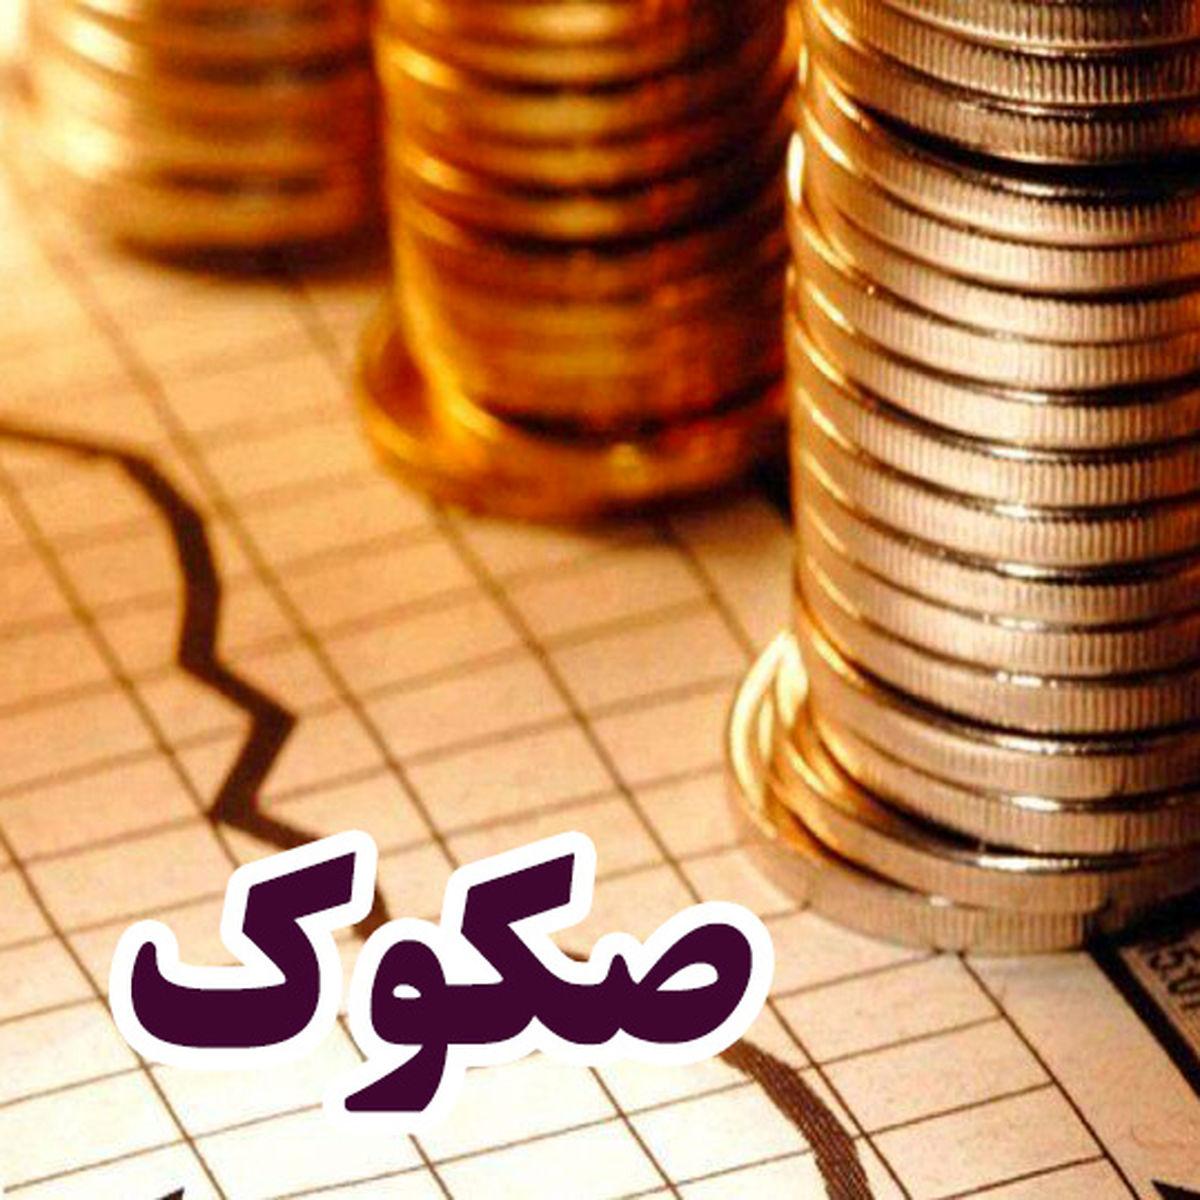 عرضه ۵ هزار میلیارد ریال صکوک مرابحه